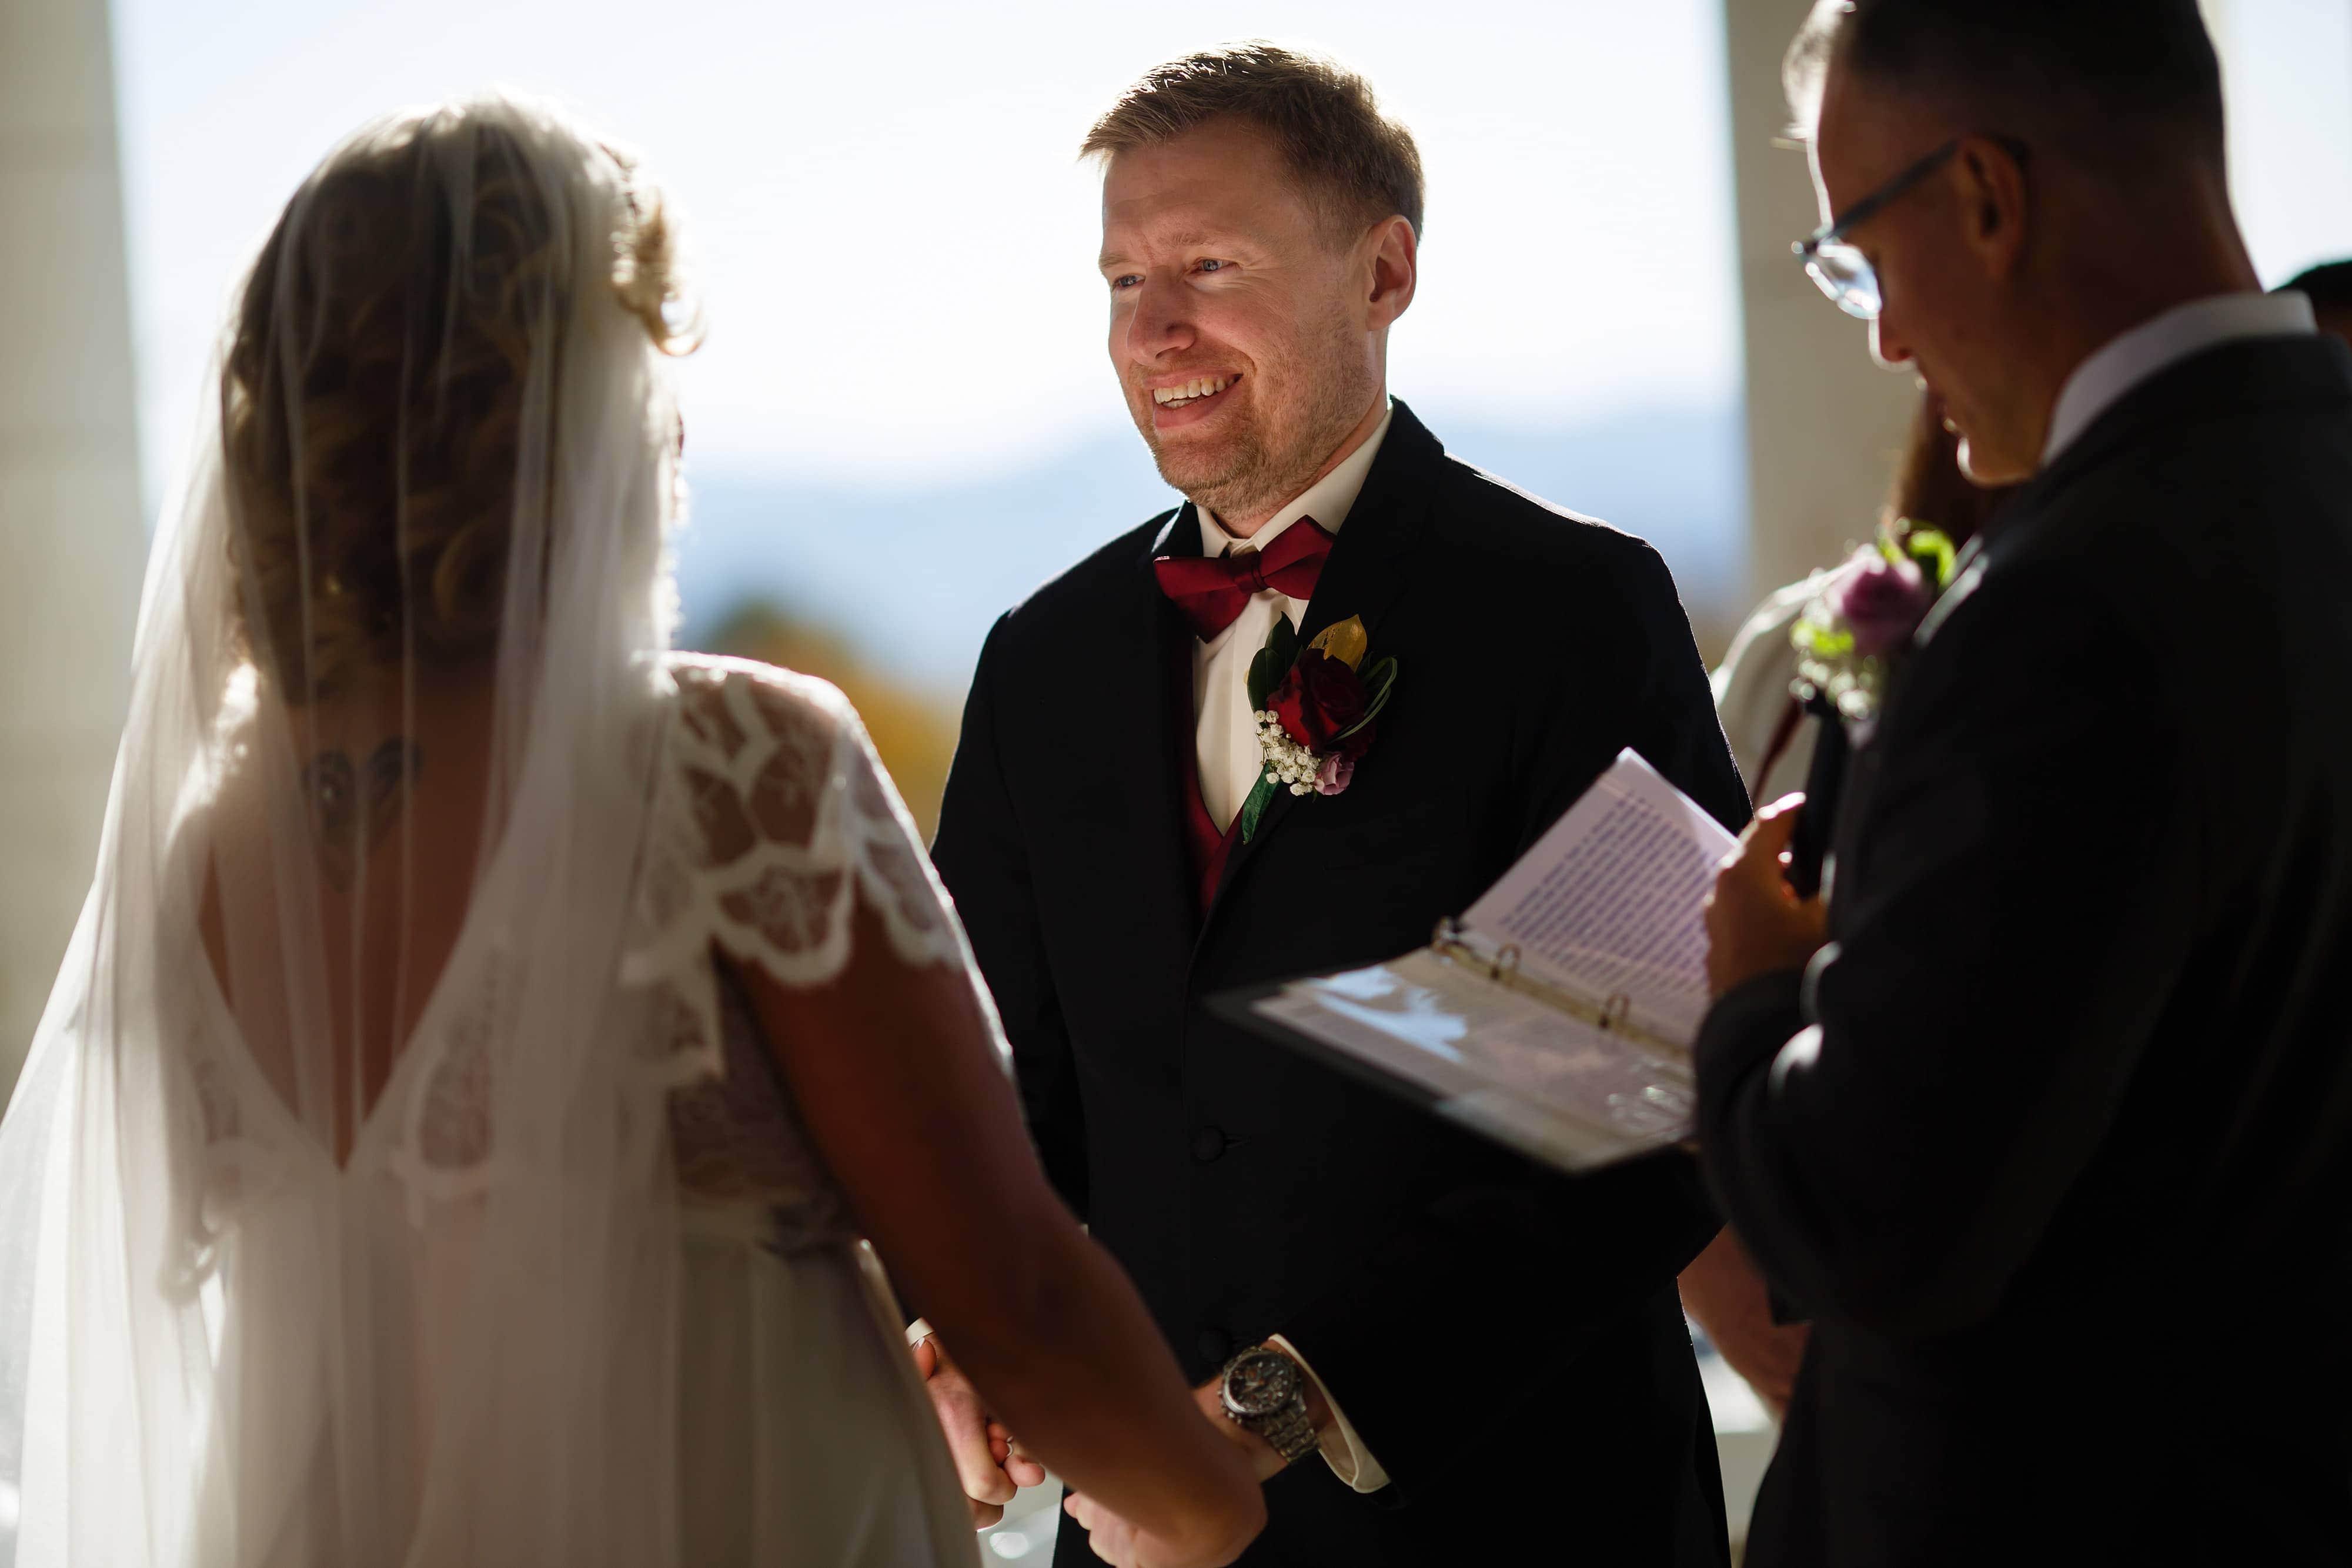 Ryan smiles at Sarah during their wedding ceremony at Cheesman Park